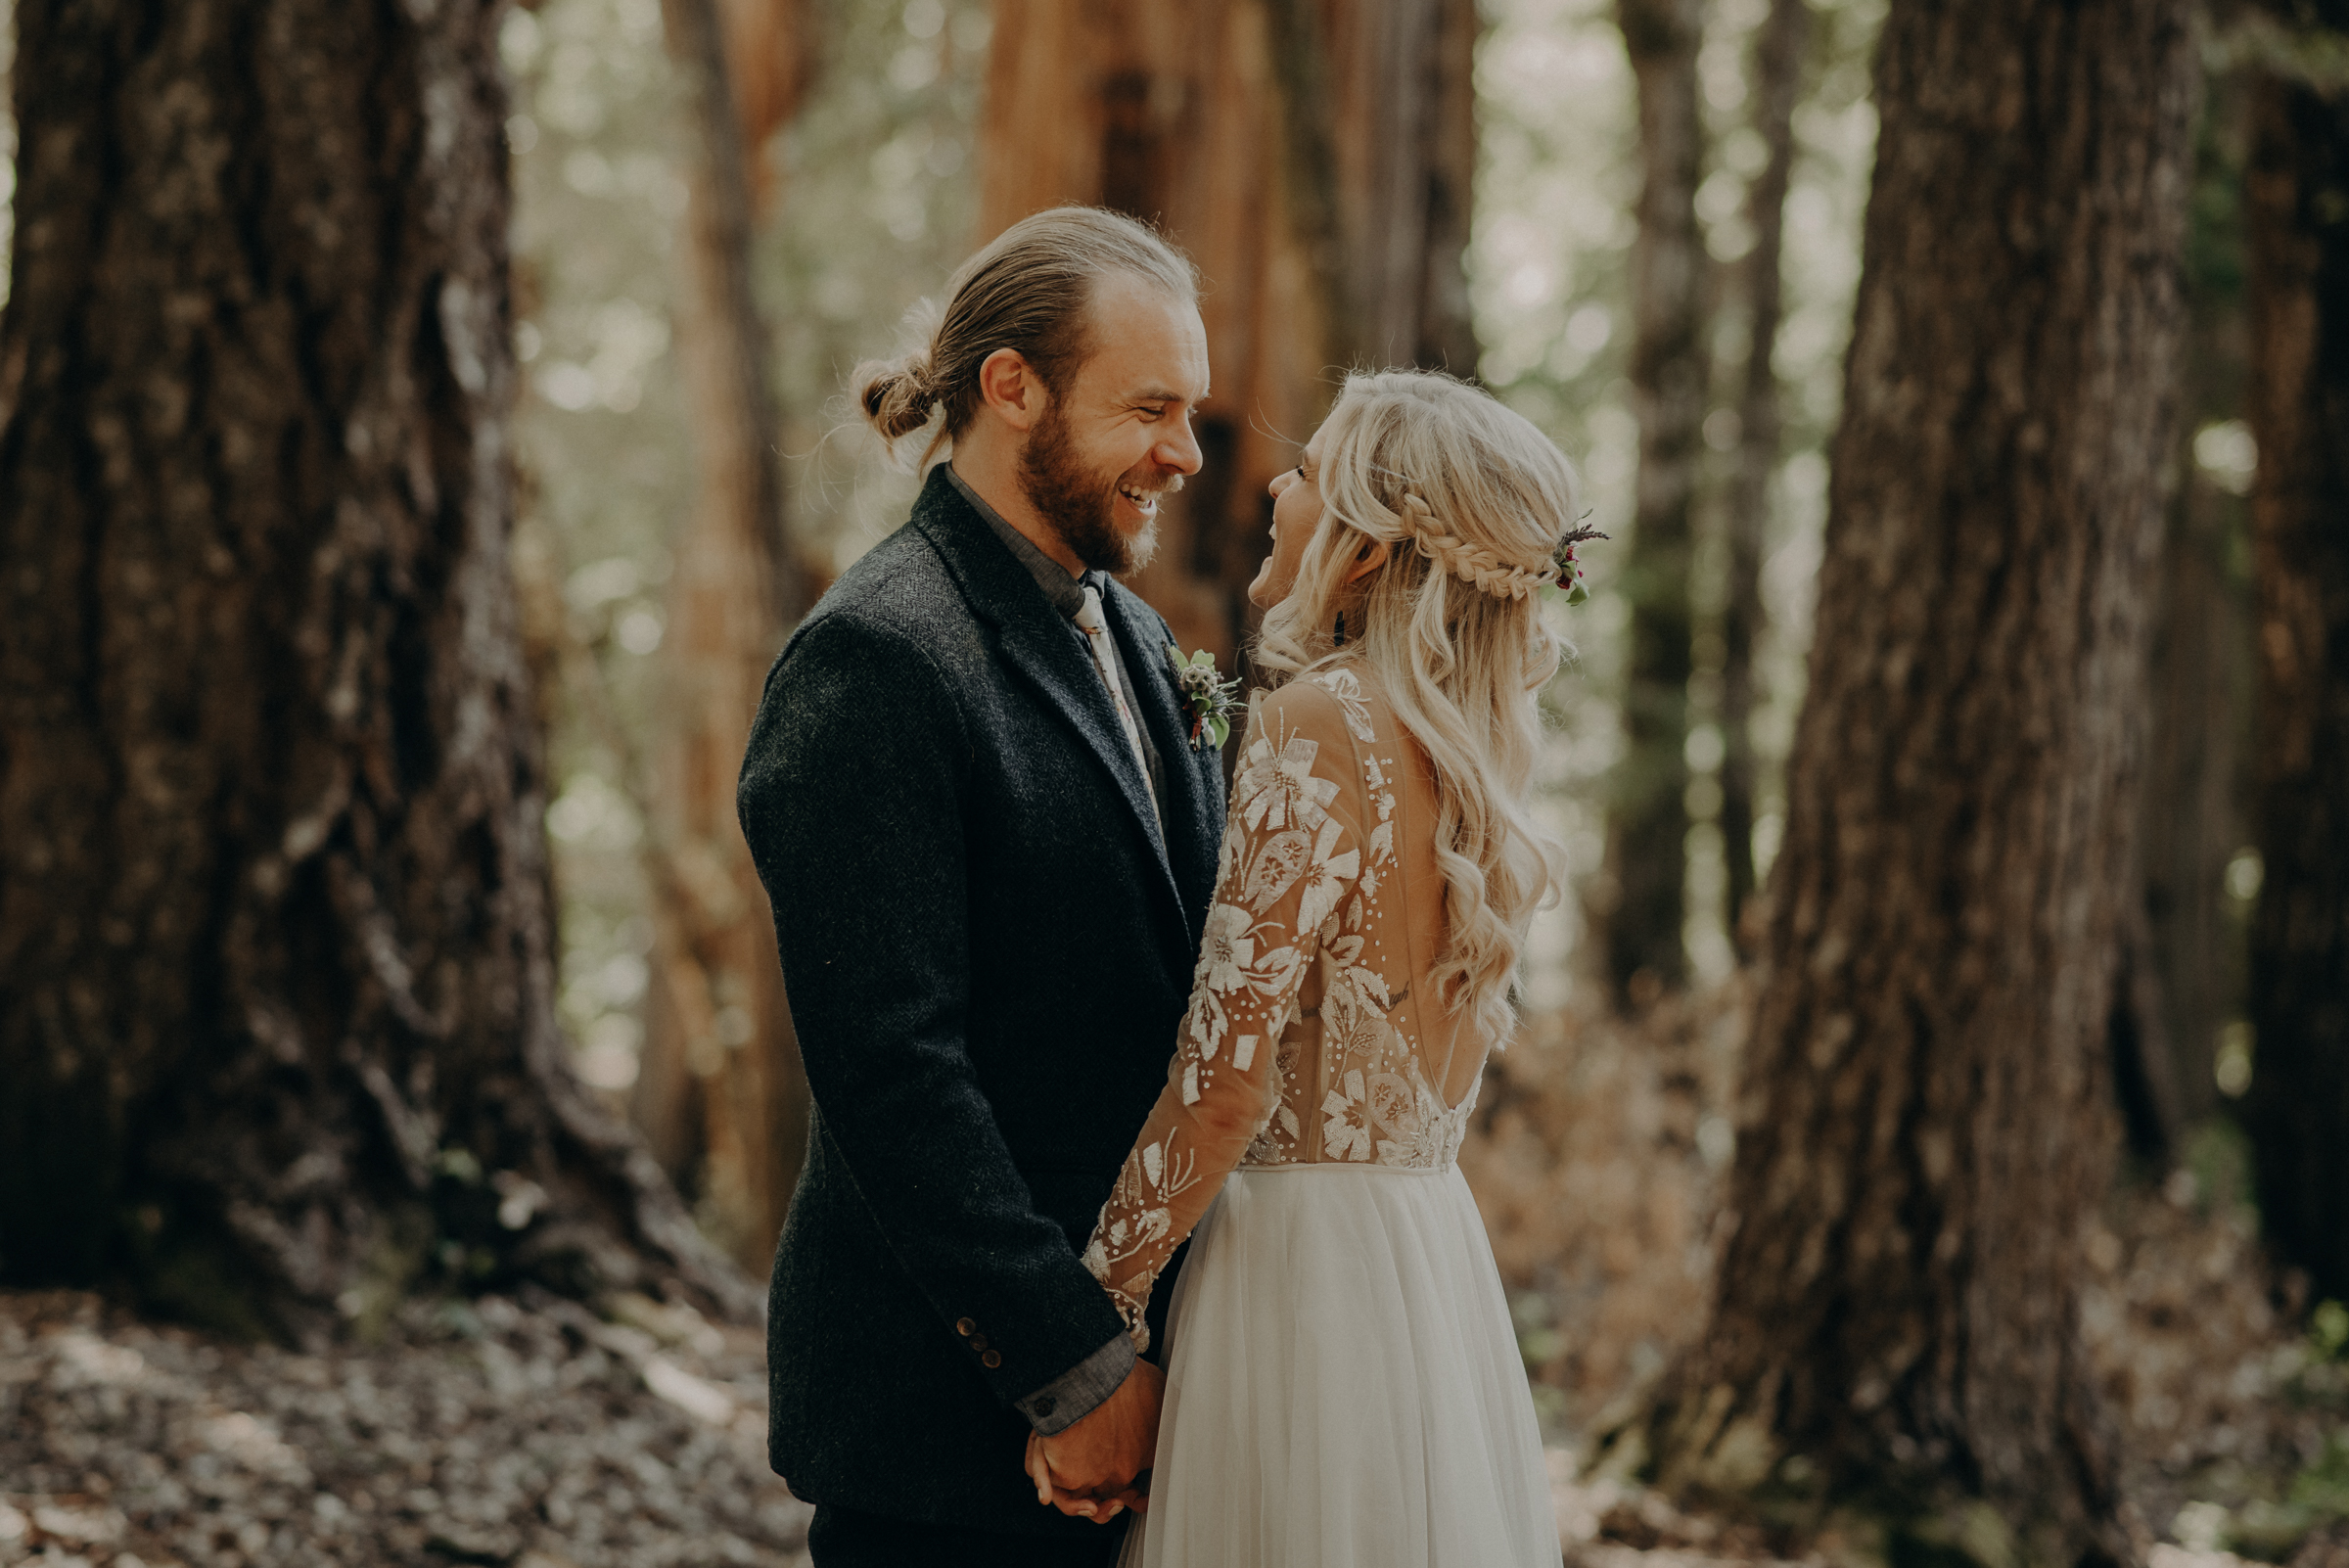 IsaiahAndTaylor.com - California Destination Elopement, Lake Leonard Reserve Wedding, Ukiah-067.jpg